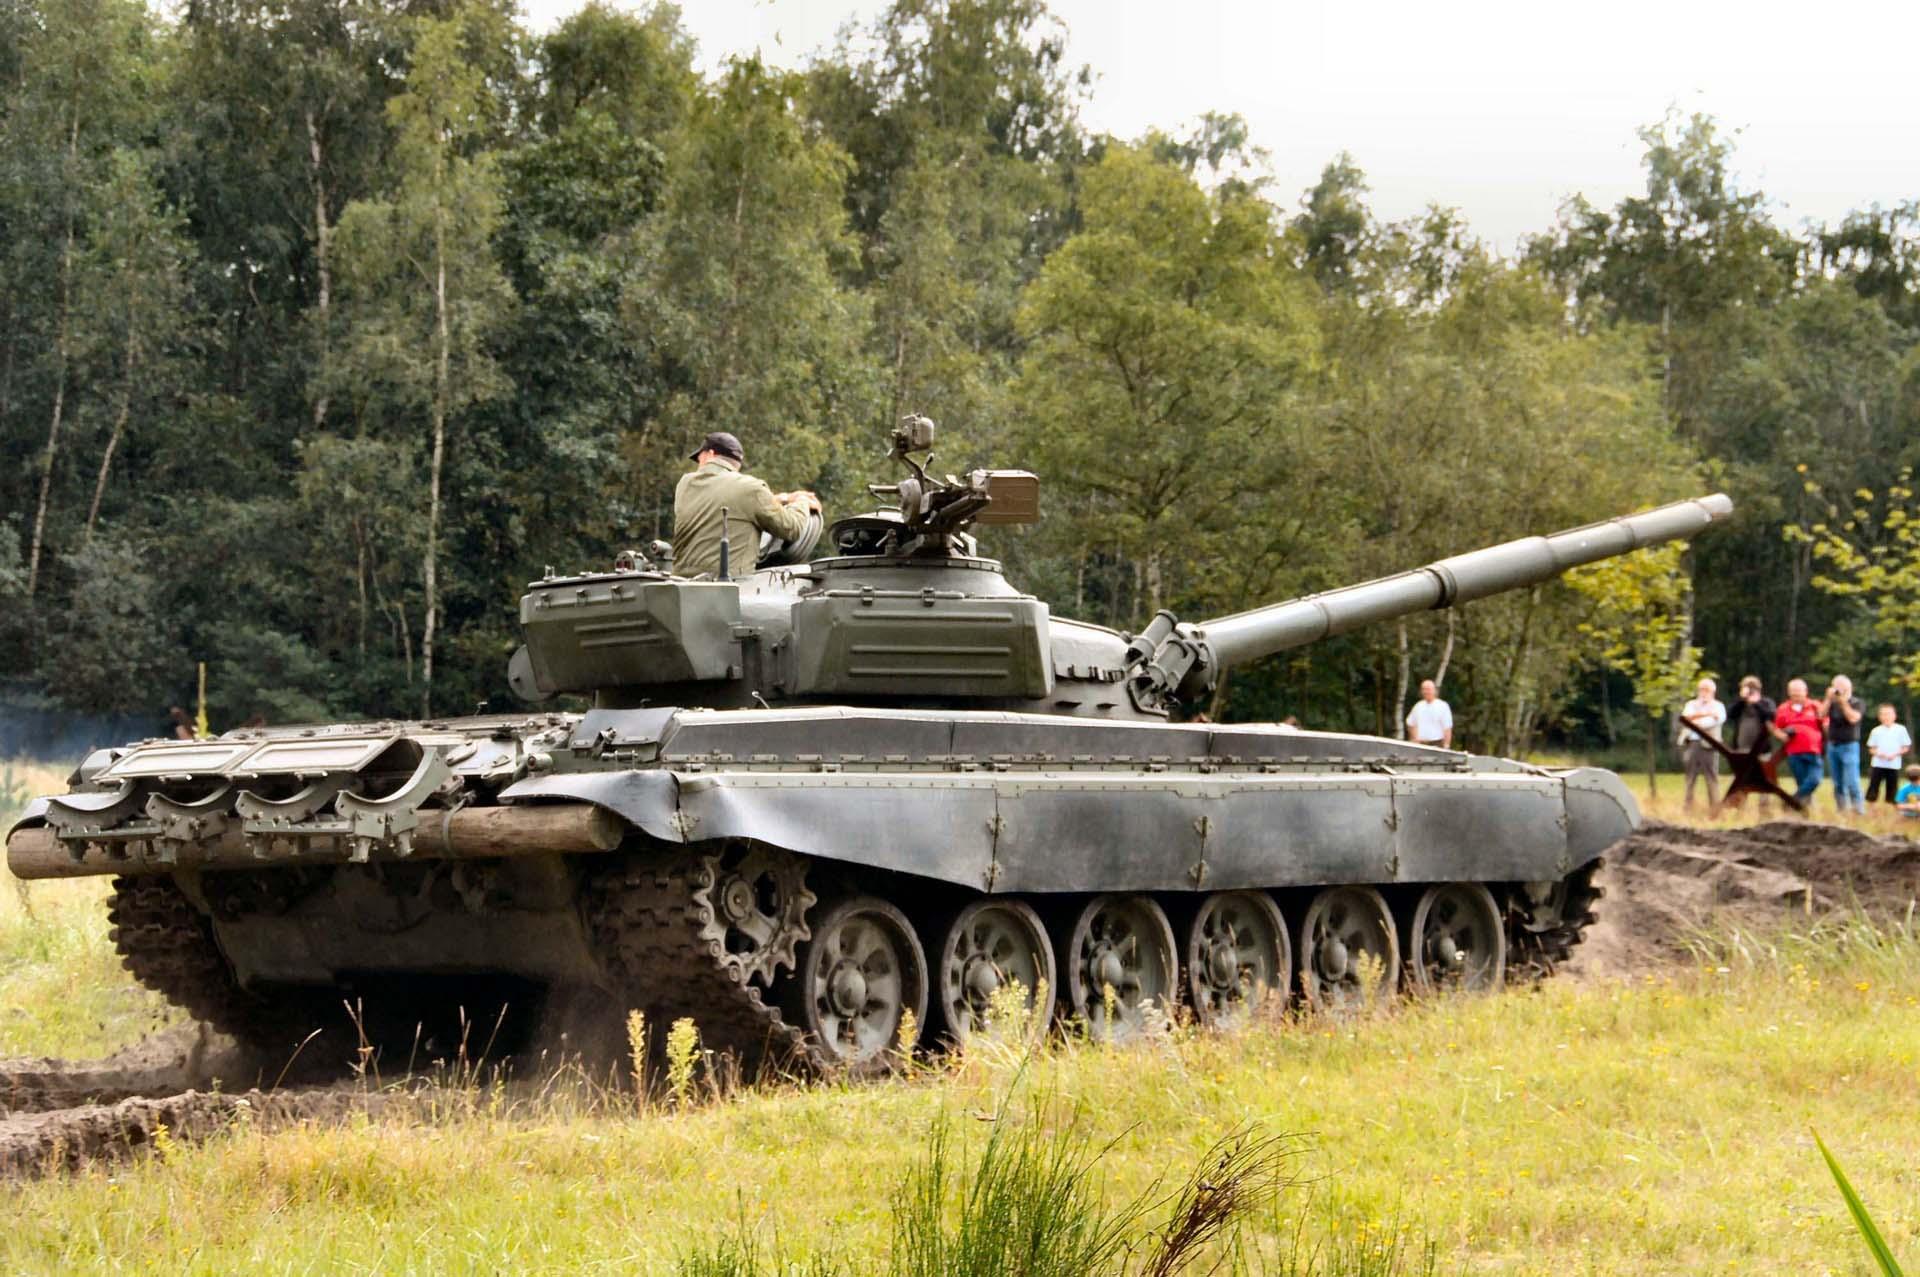 https://tanksdb.ru/images/photos/t-72/tanksdb.ru_t-72_21.jpg